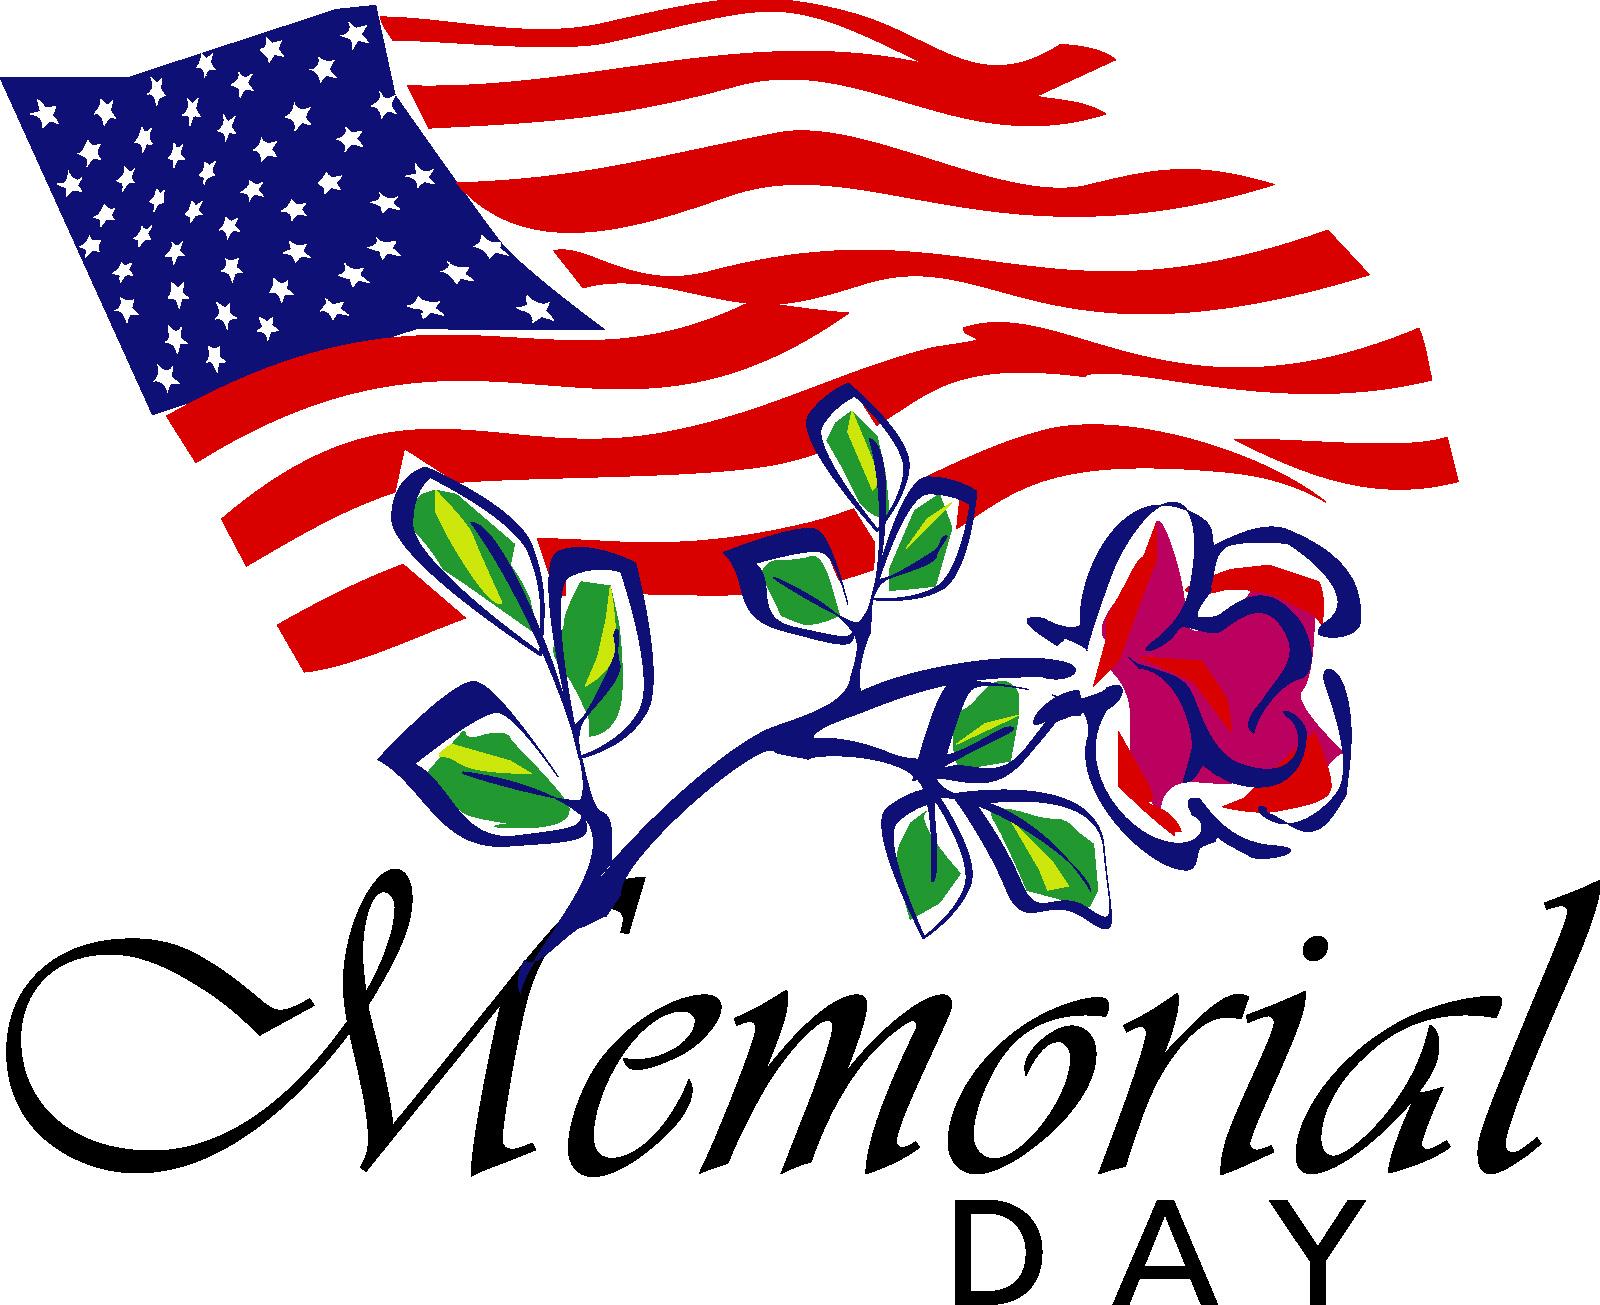 Veterans Day Clipart.